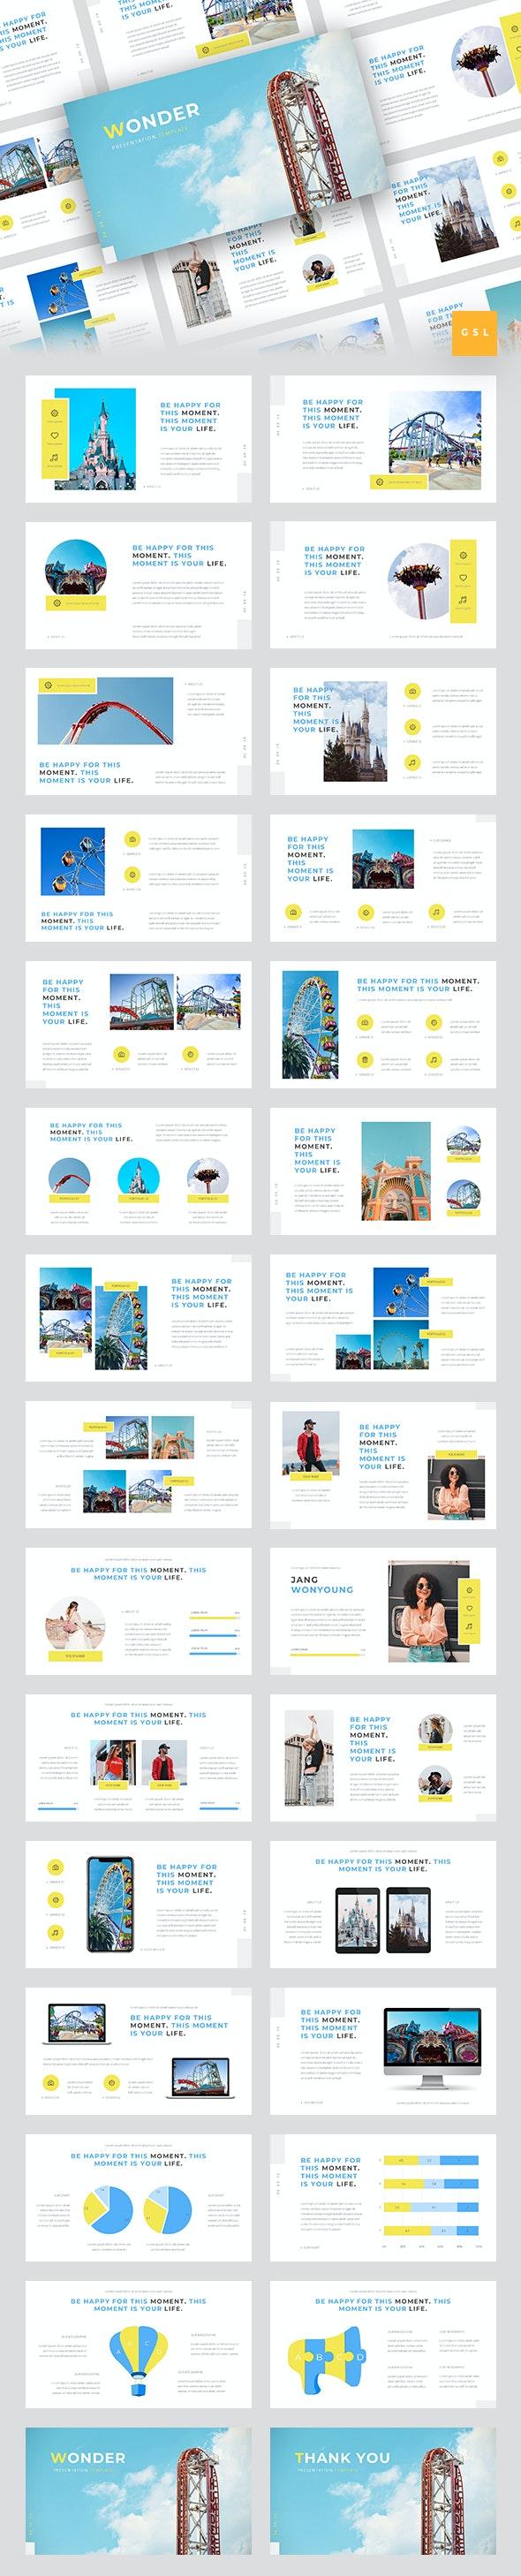 Wonder - Theme Park Google Slides Template - Google Slides Presentation Templates